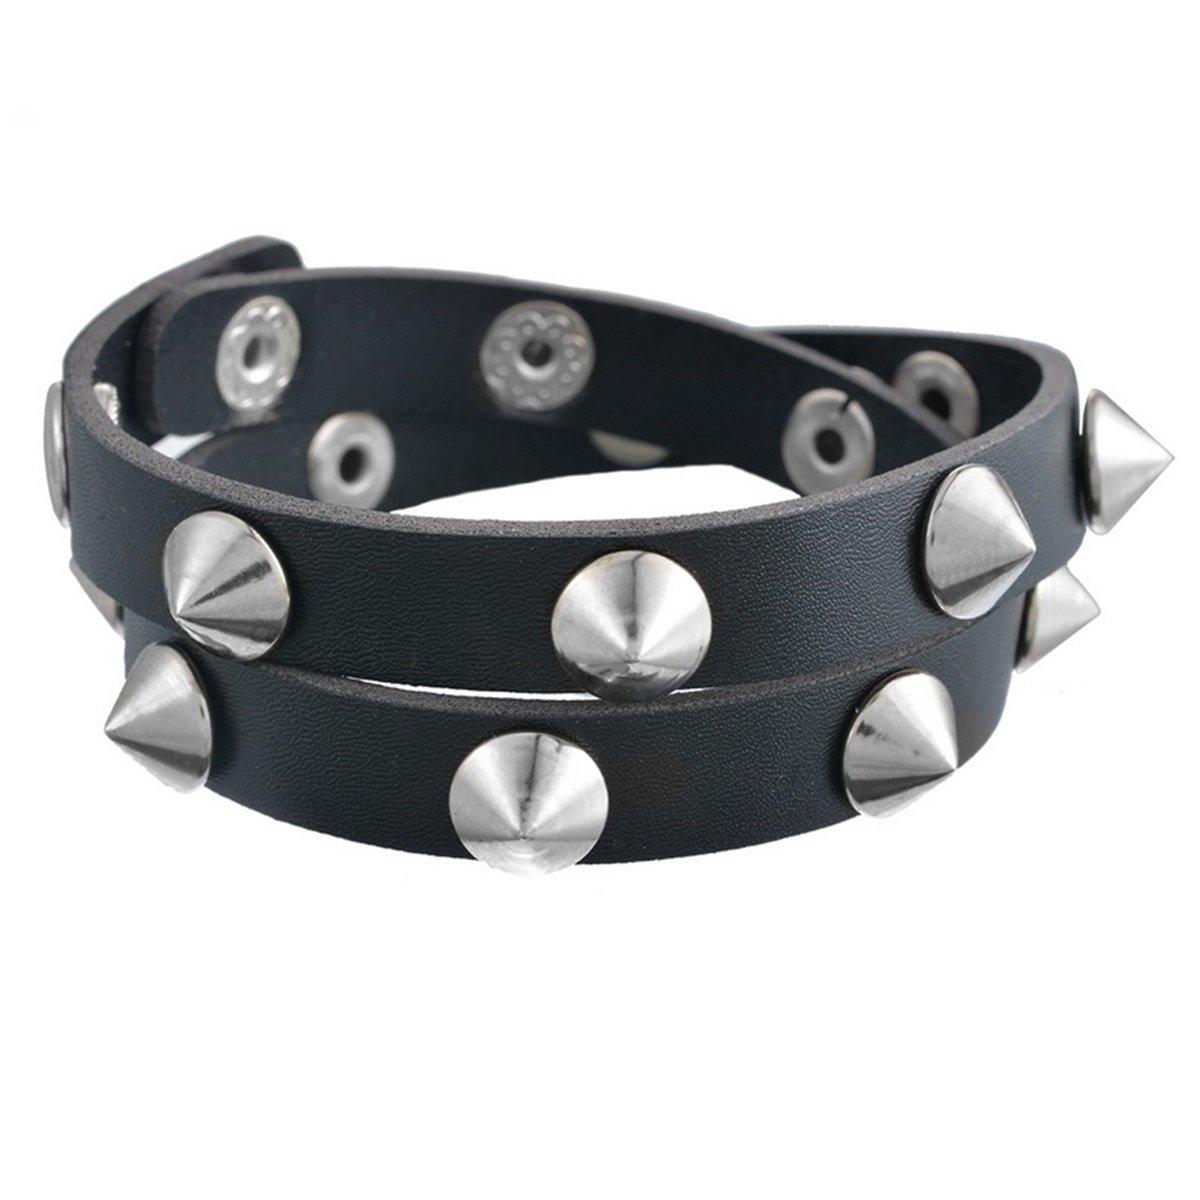 HooAMI Fashion Punk Style Rivet MultiLayer Rivet Leather Bracelet Wristband